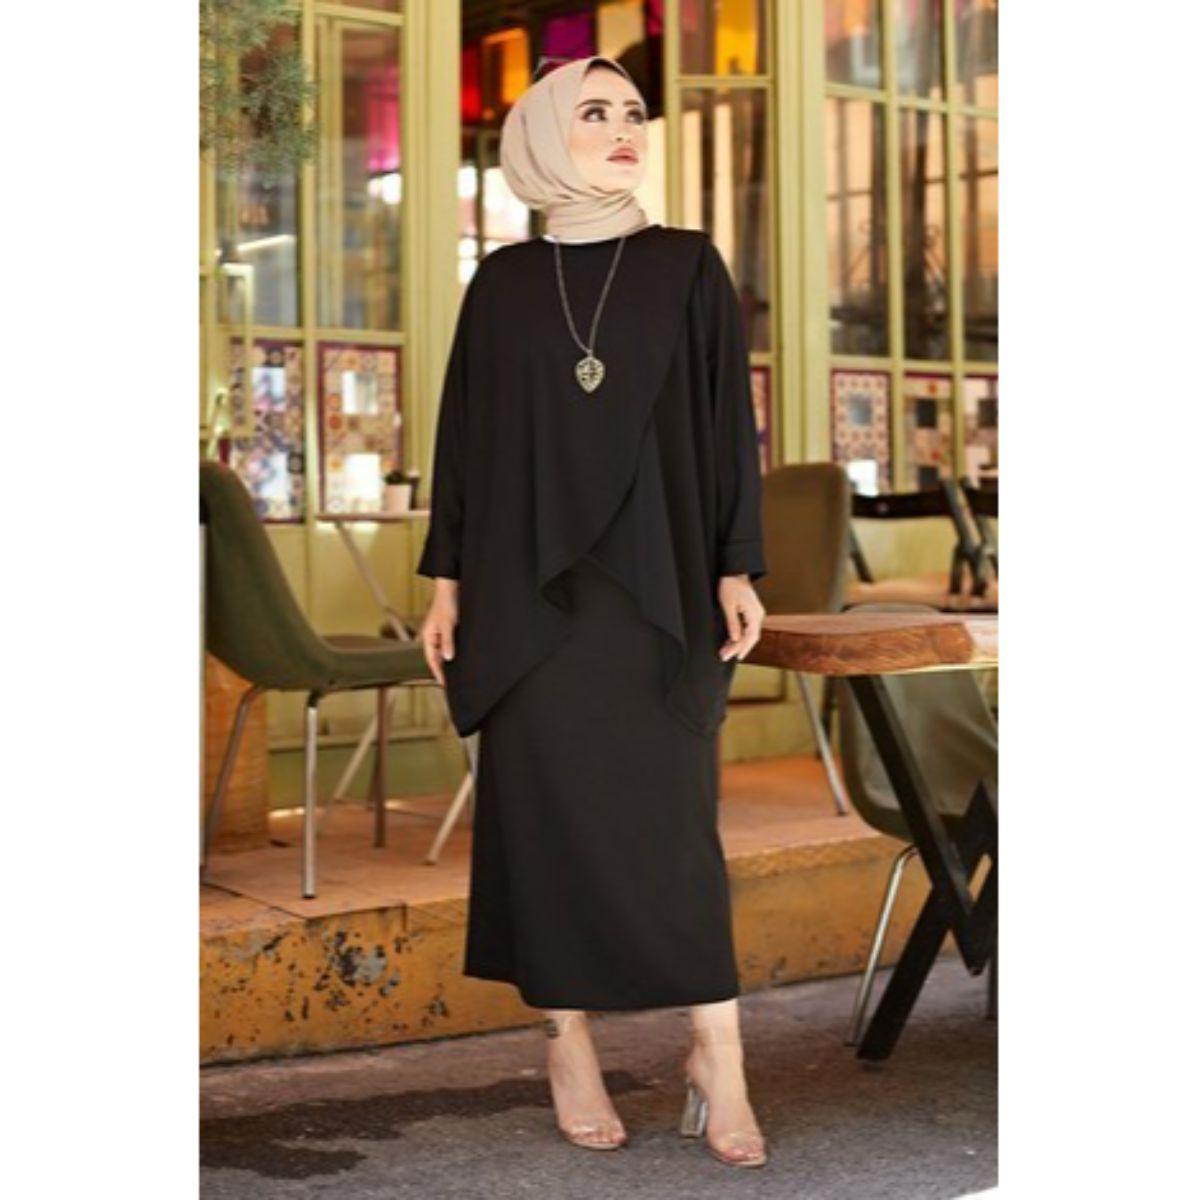 Muslim Double Team Muslim Fashion Abaya Caftan Kaftan İslamic Clothing Turley Dubai 2021 Fashion Women Clothing